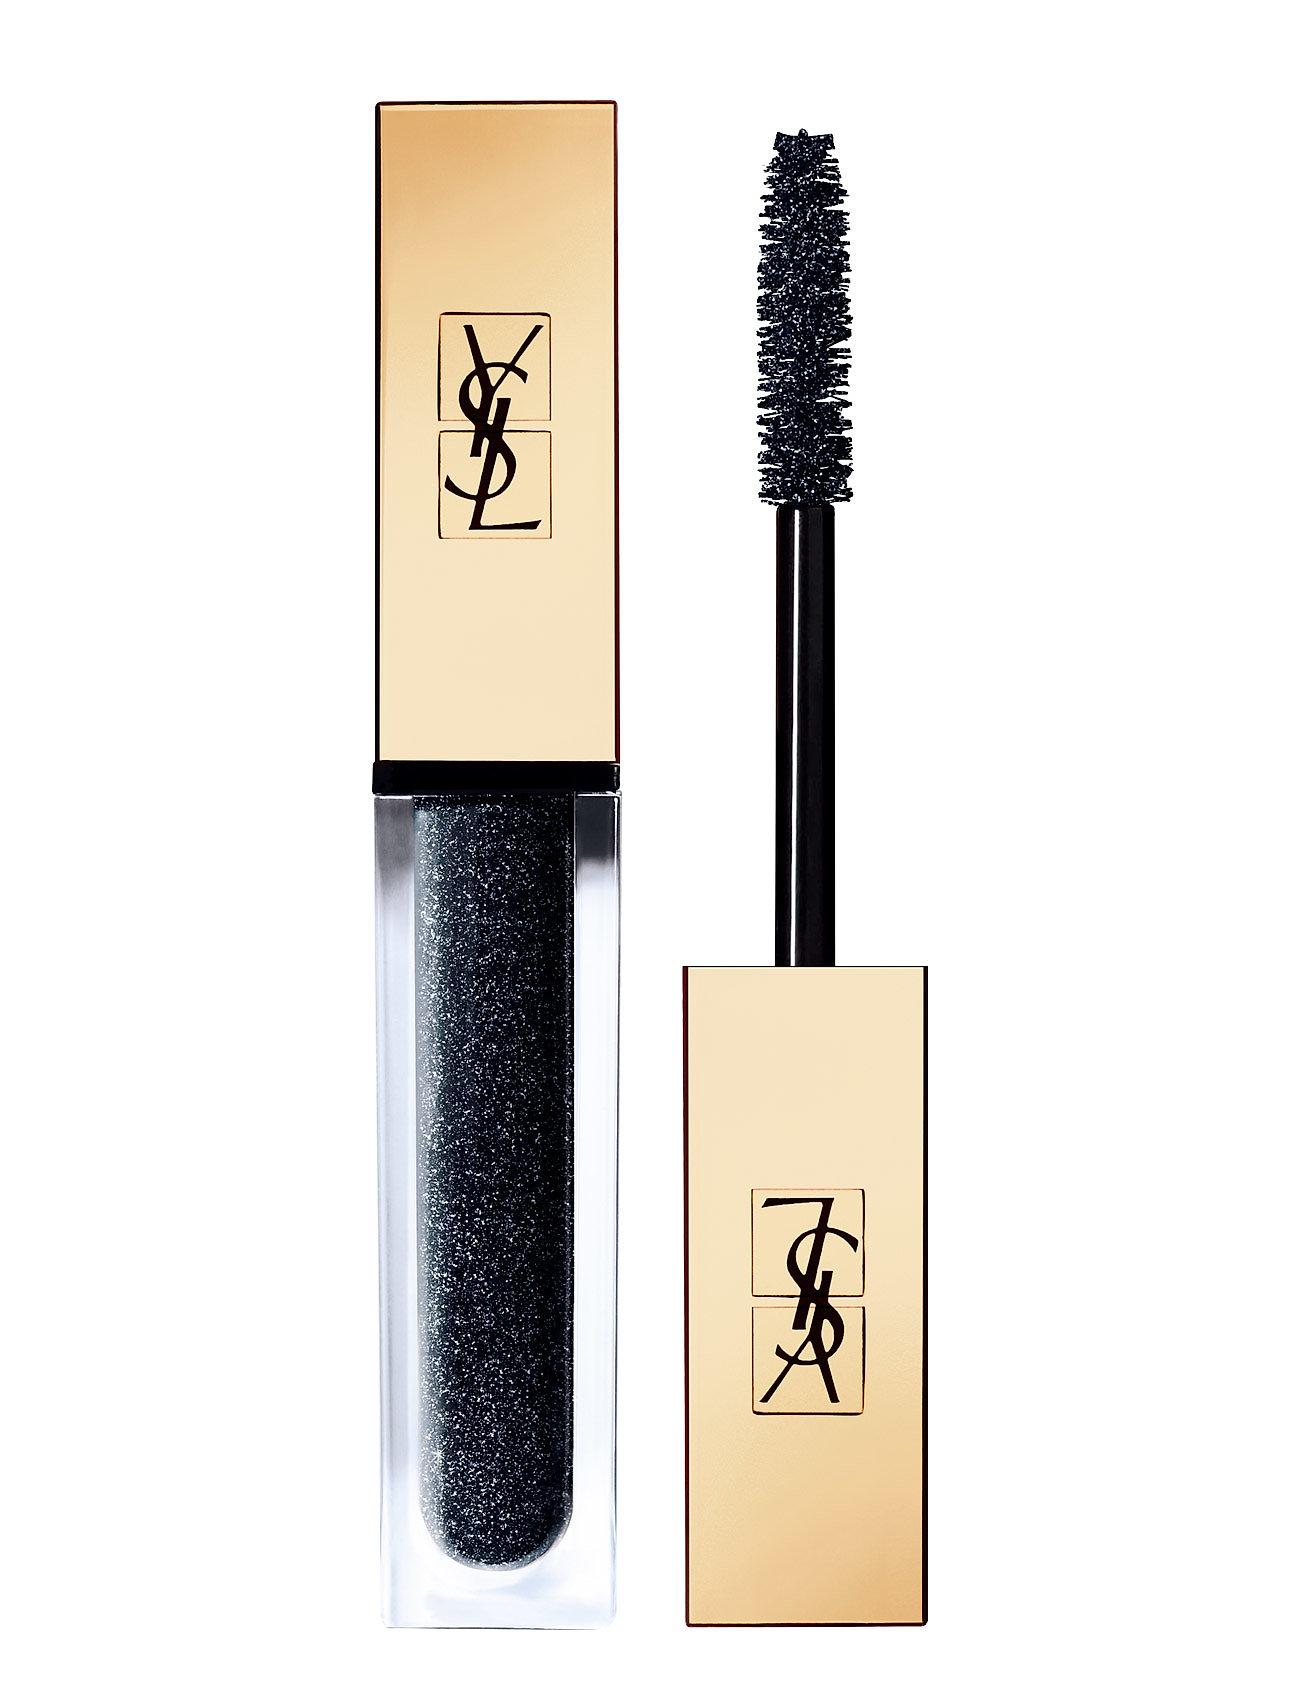 Mascara Vinyl Couture 0 Smudgeproof Top Coat - Yves Saint Laurent